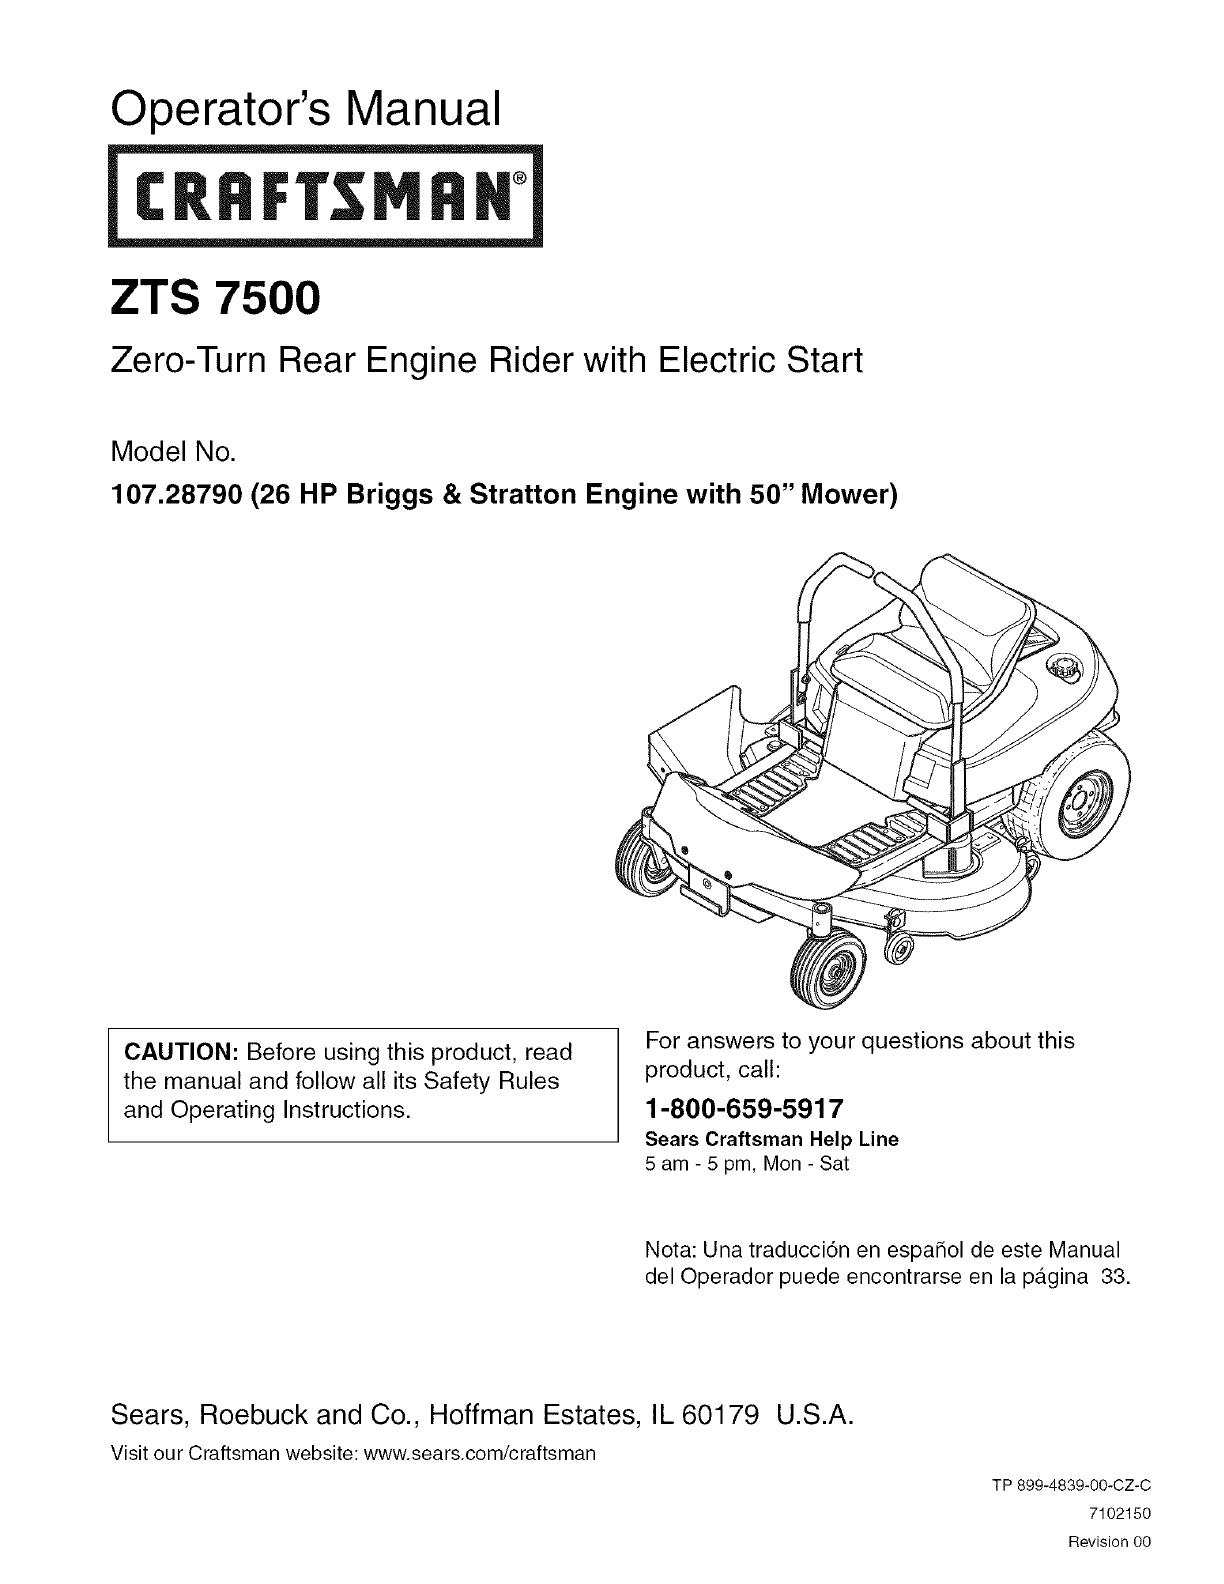 Craftsman 107287900 User Manual Zero Turn Rear Engine Rider Manuals Briggs 26 Stratton Diagram Operators